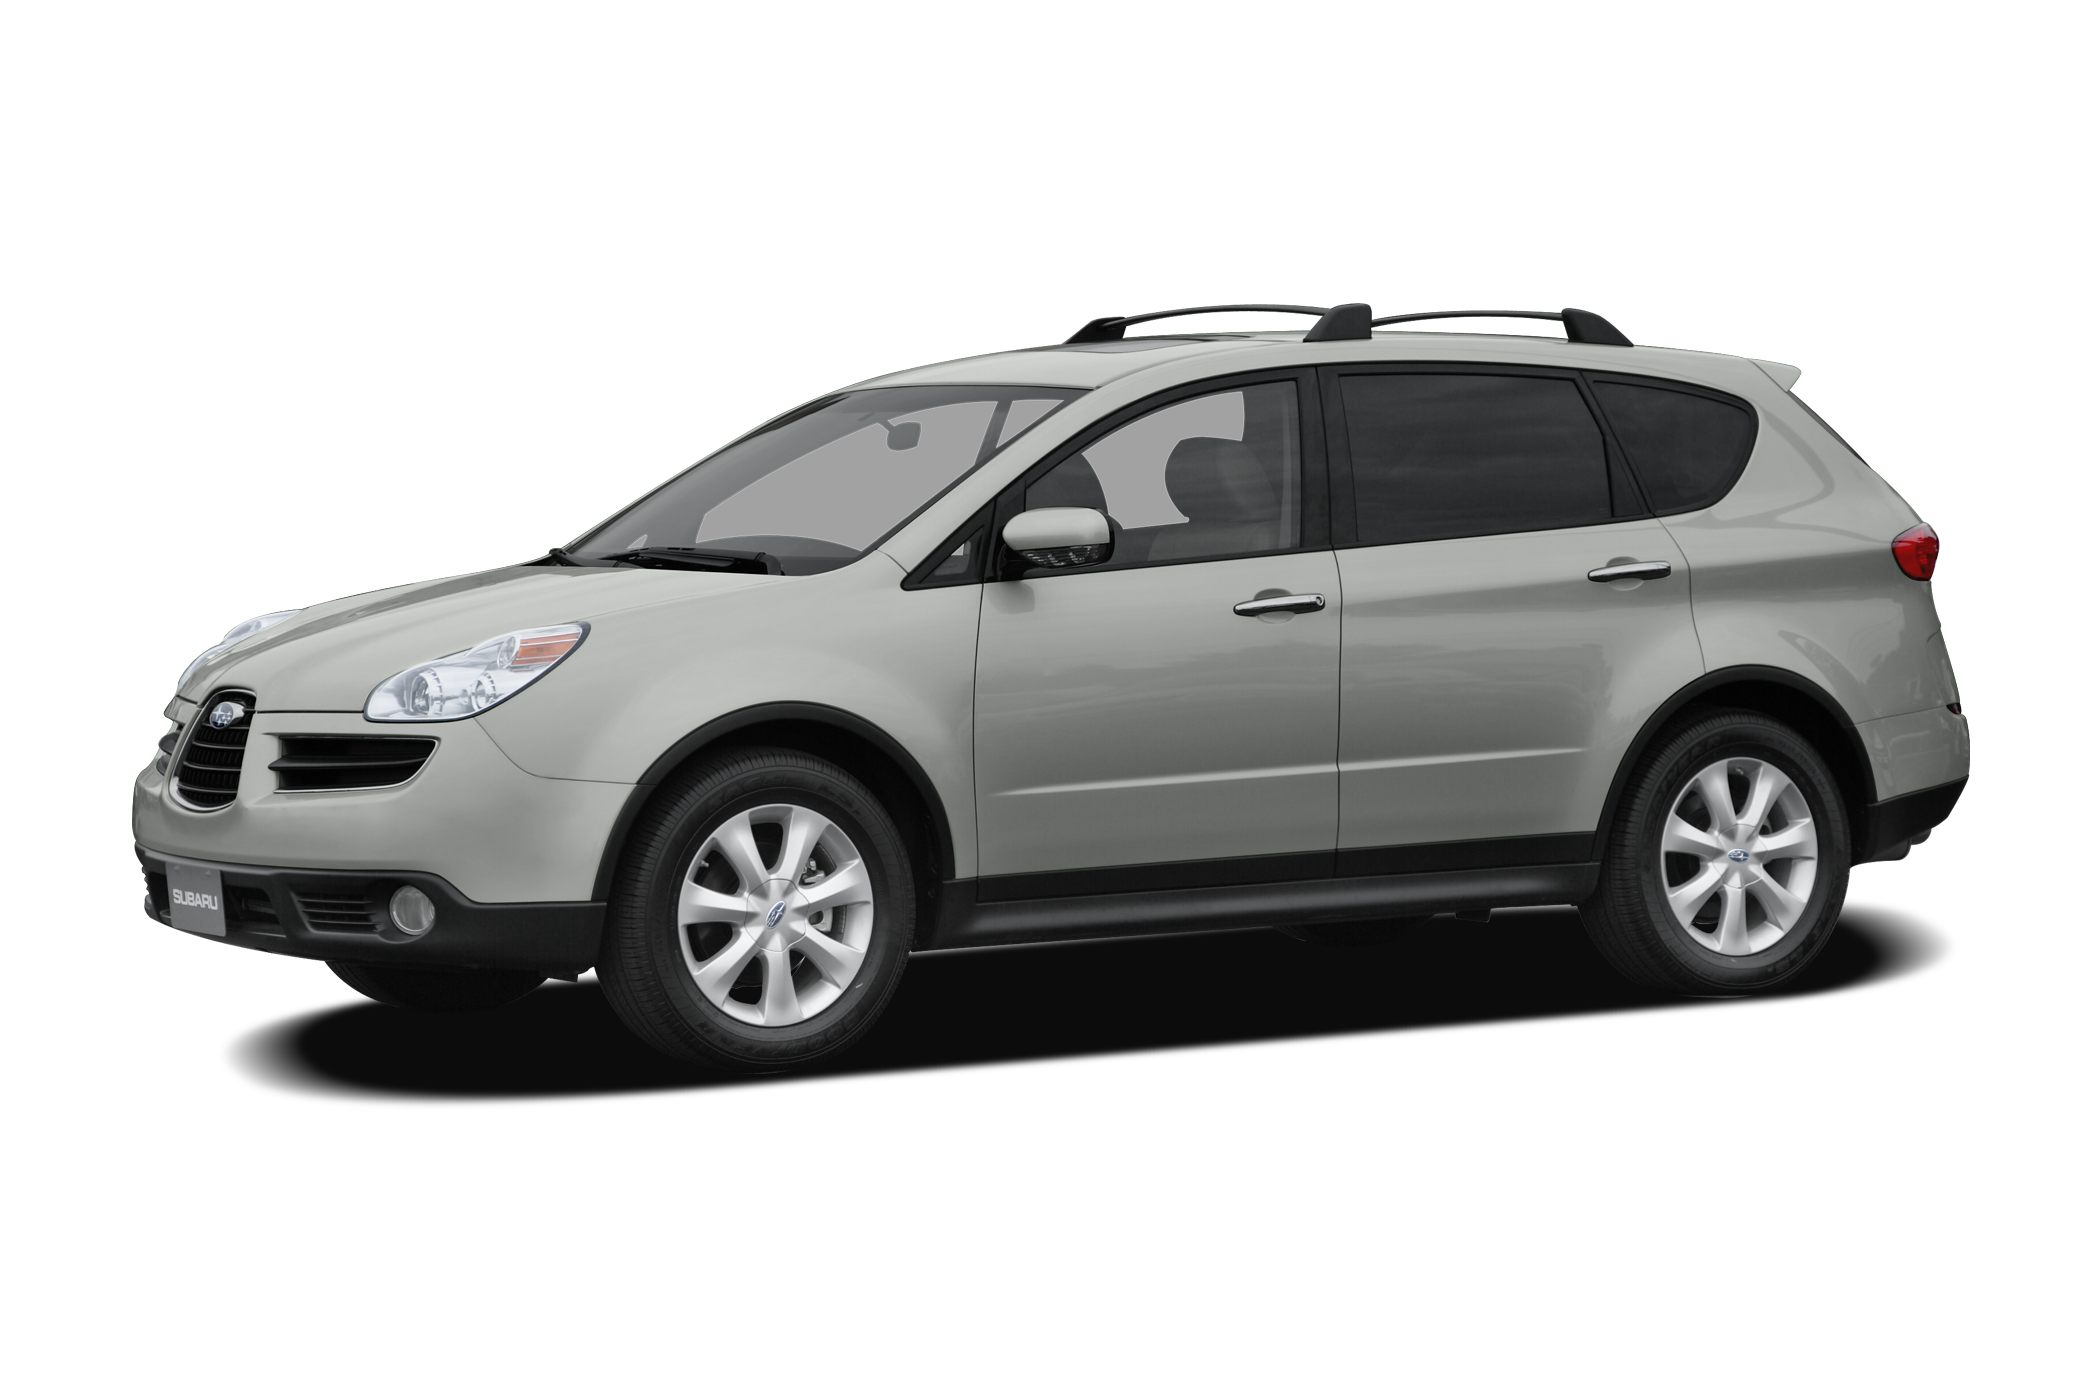 2007 Subaru B9 Tribeca Specs Safety Rating Amp Mpg Carsdirect